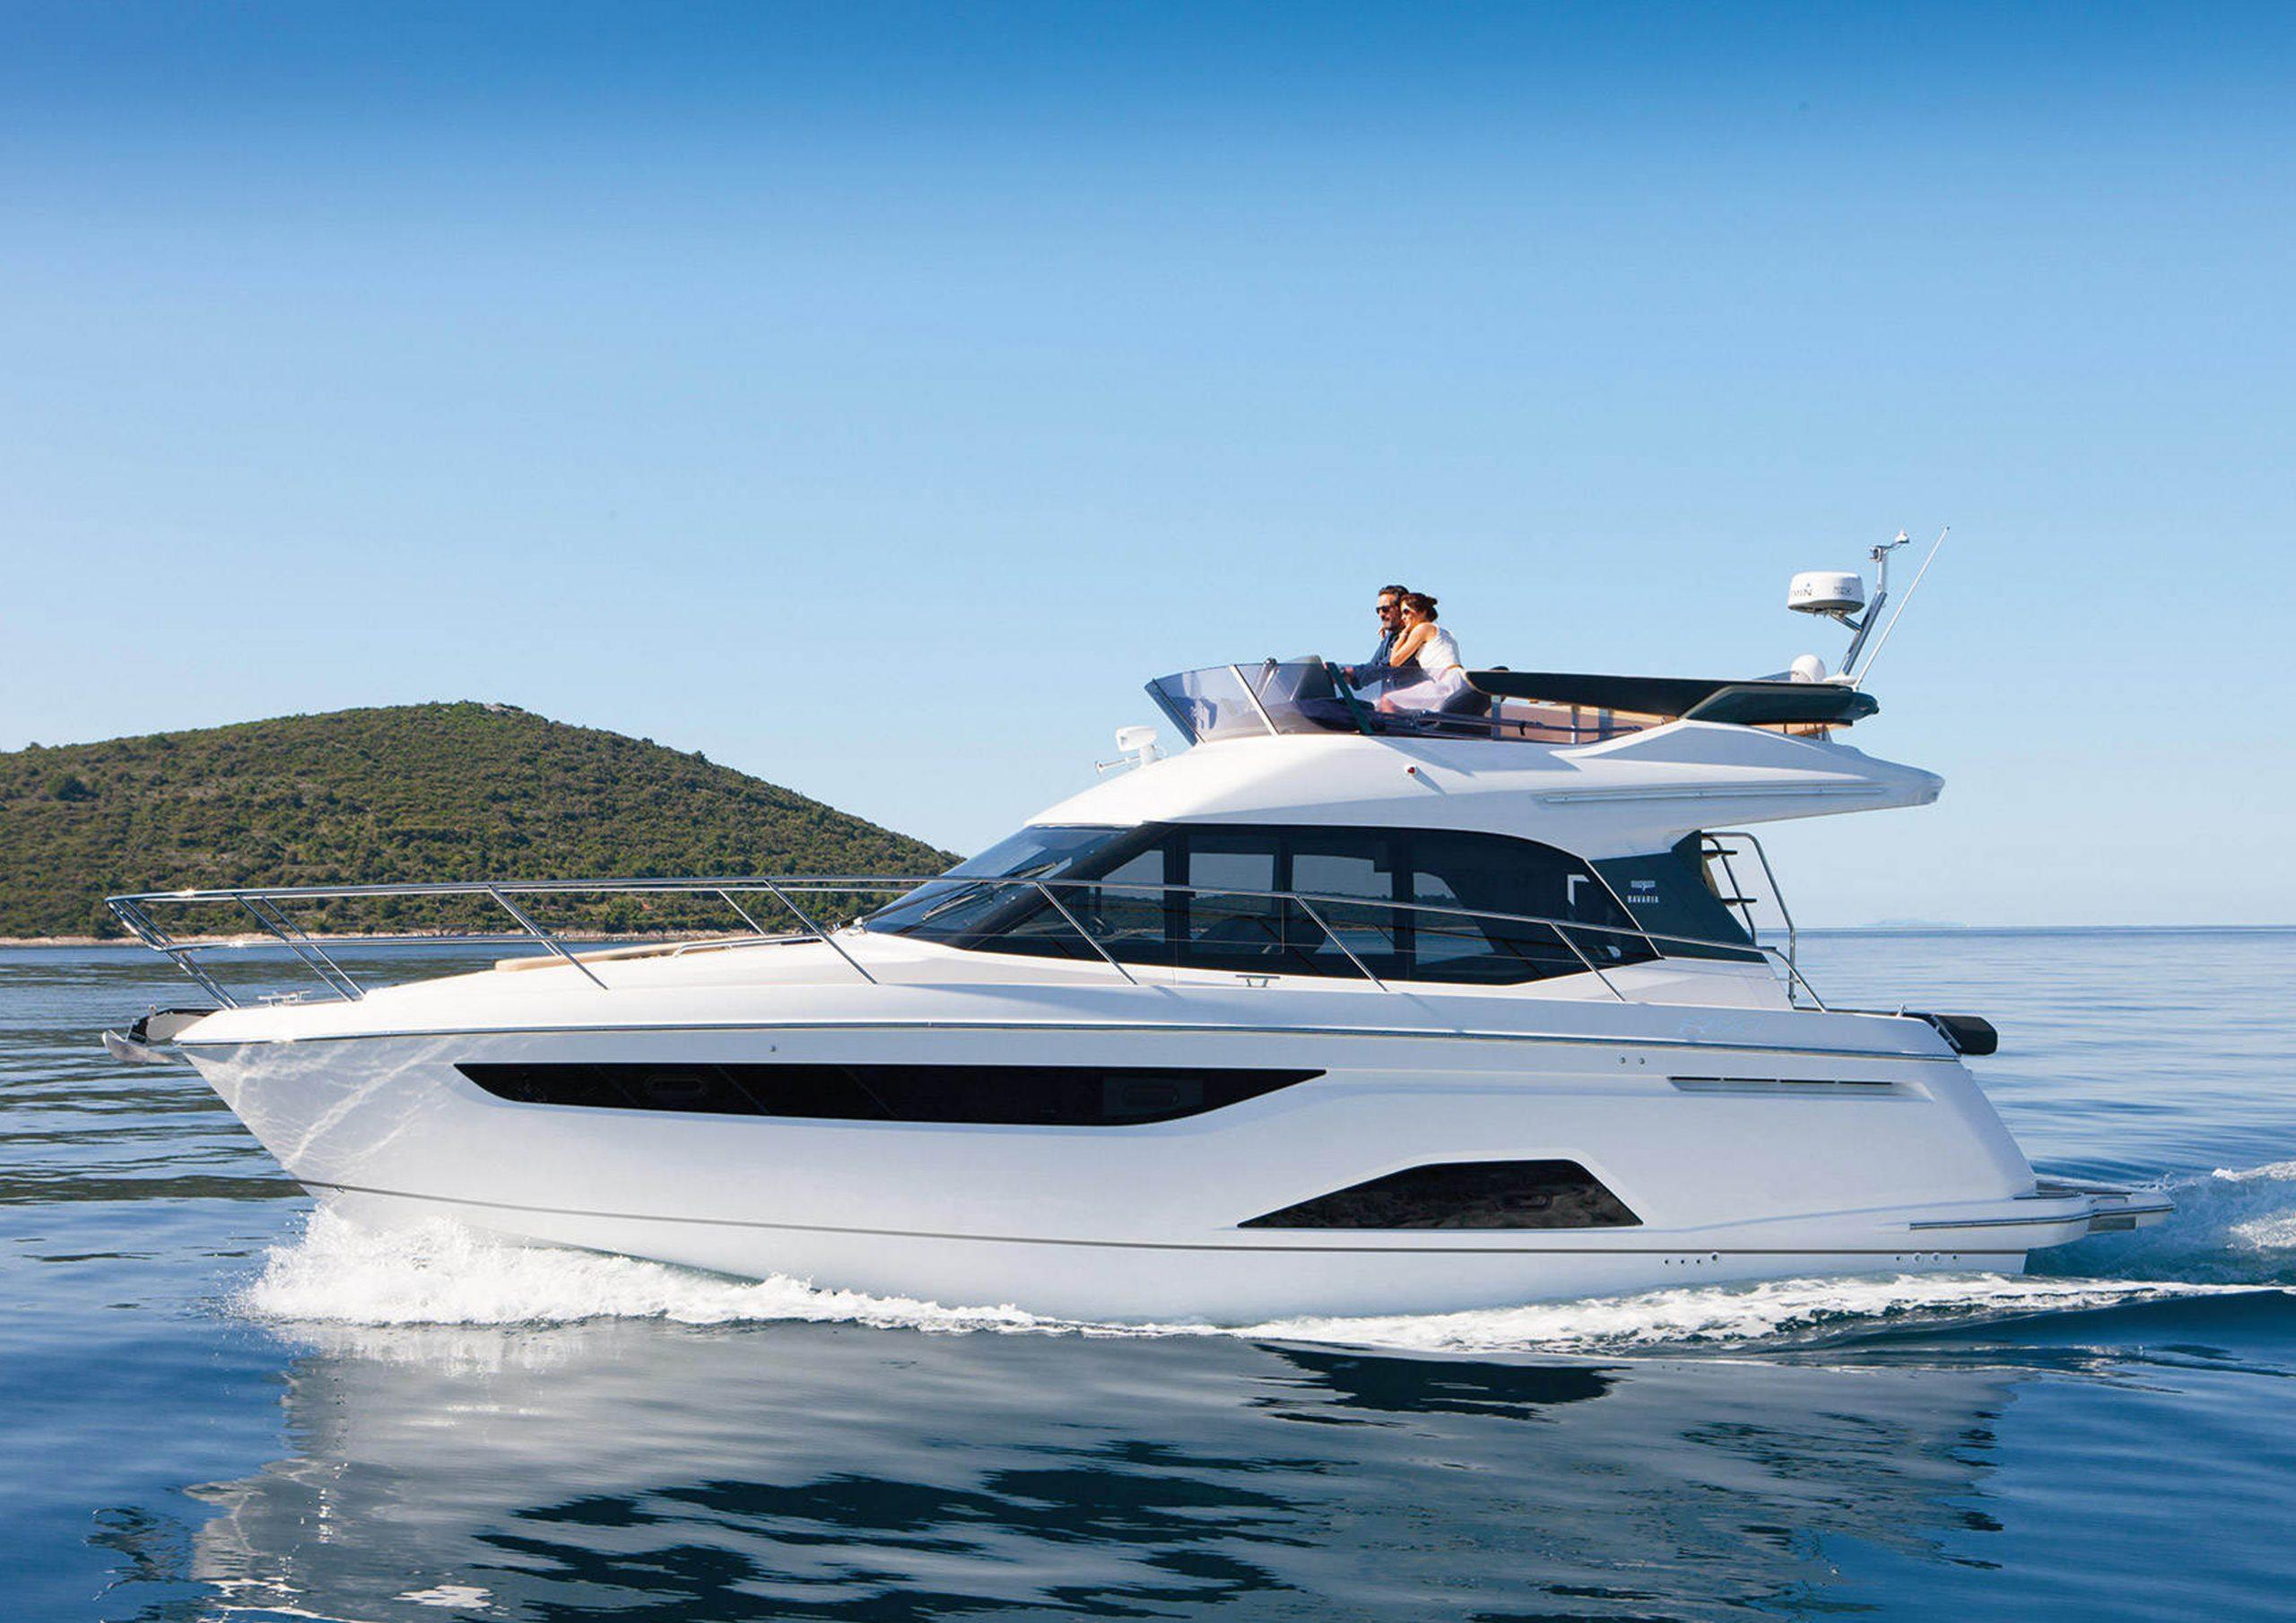 Exterior photo of the Bavaria R40 motor yacht